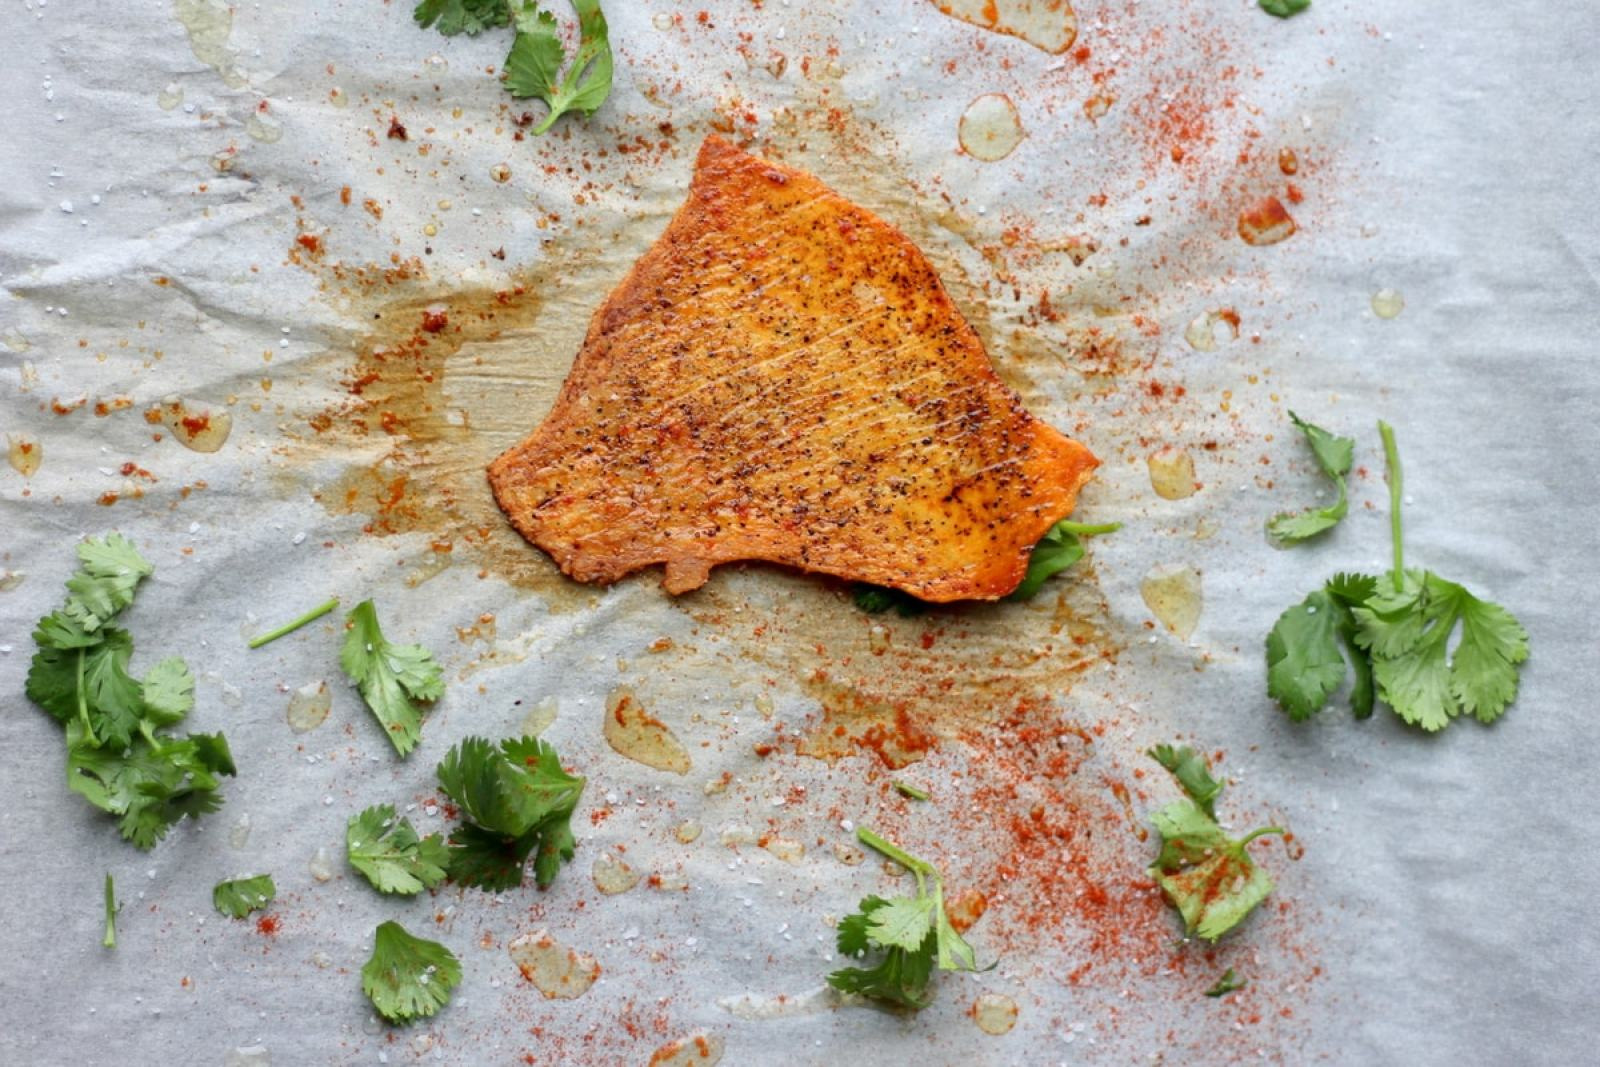 How to make crispy chicken skins - thewoodenskillet.com